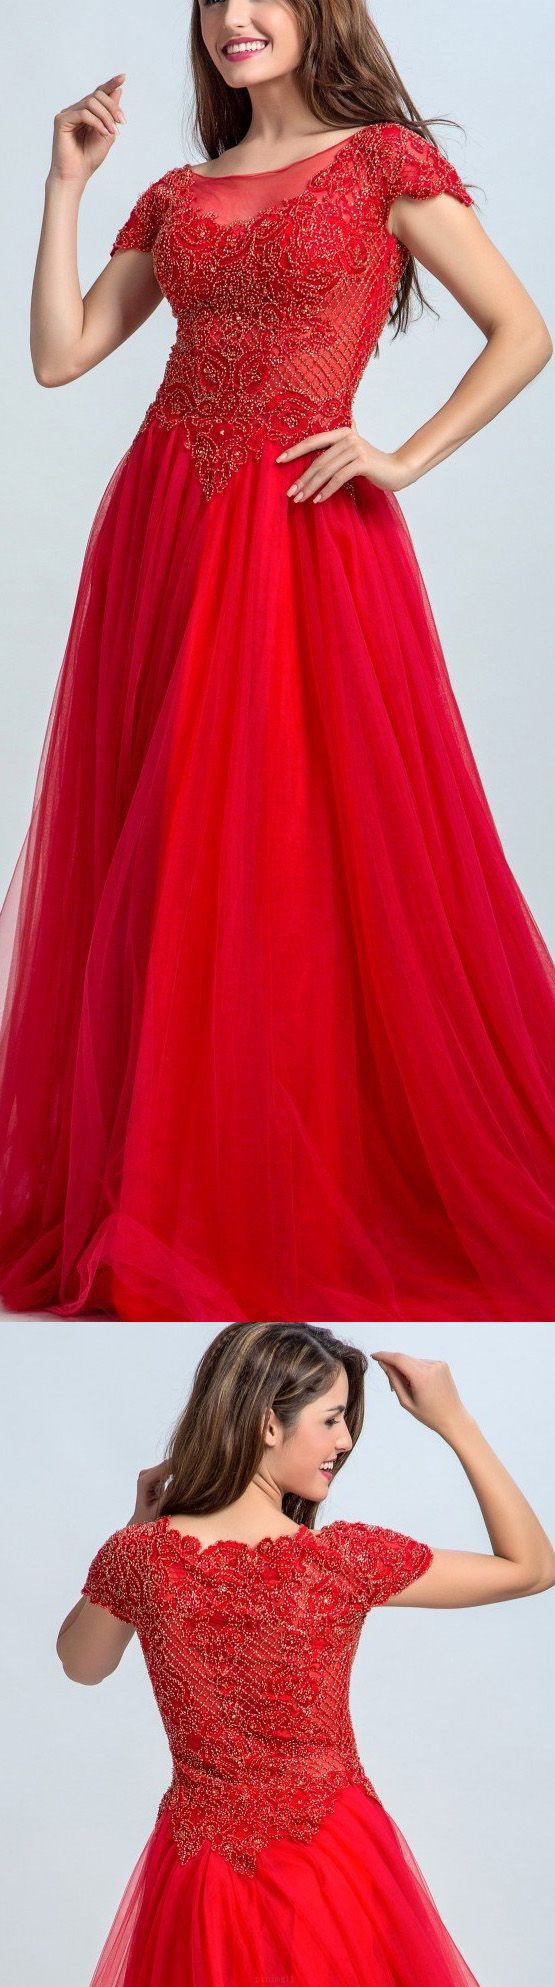 best new prom dresses images on pinterest